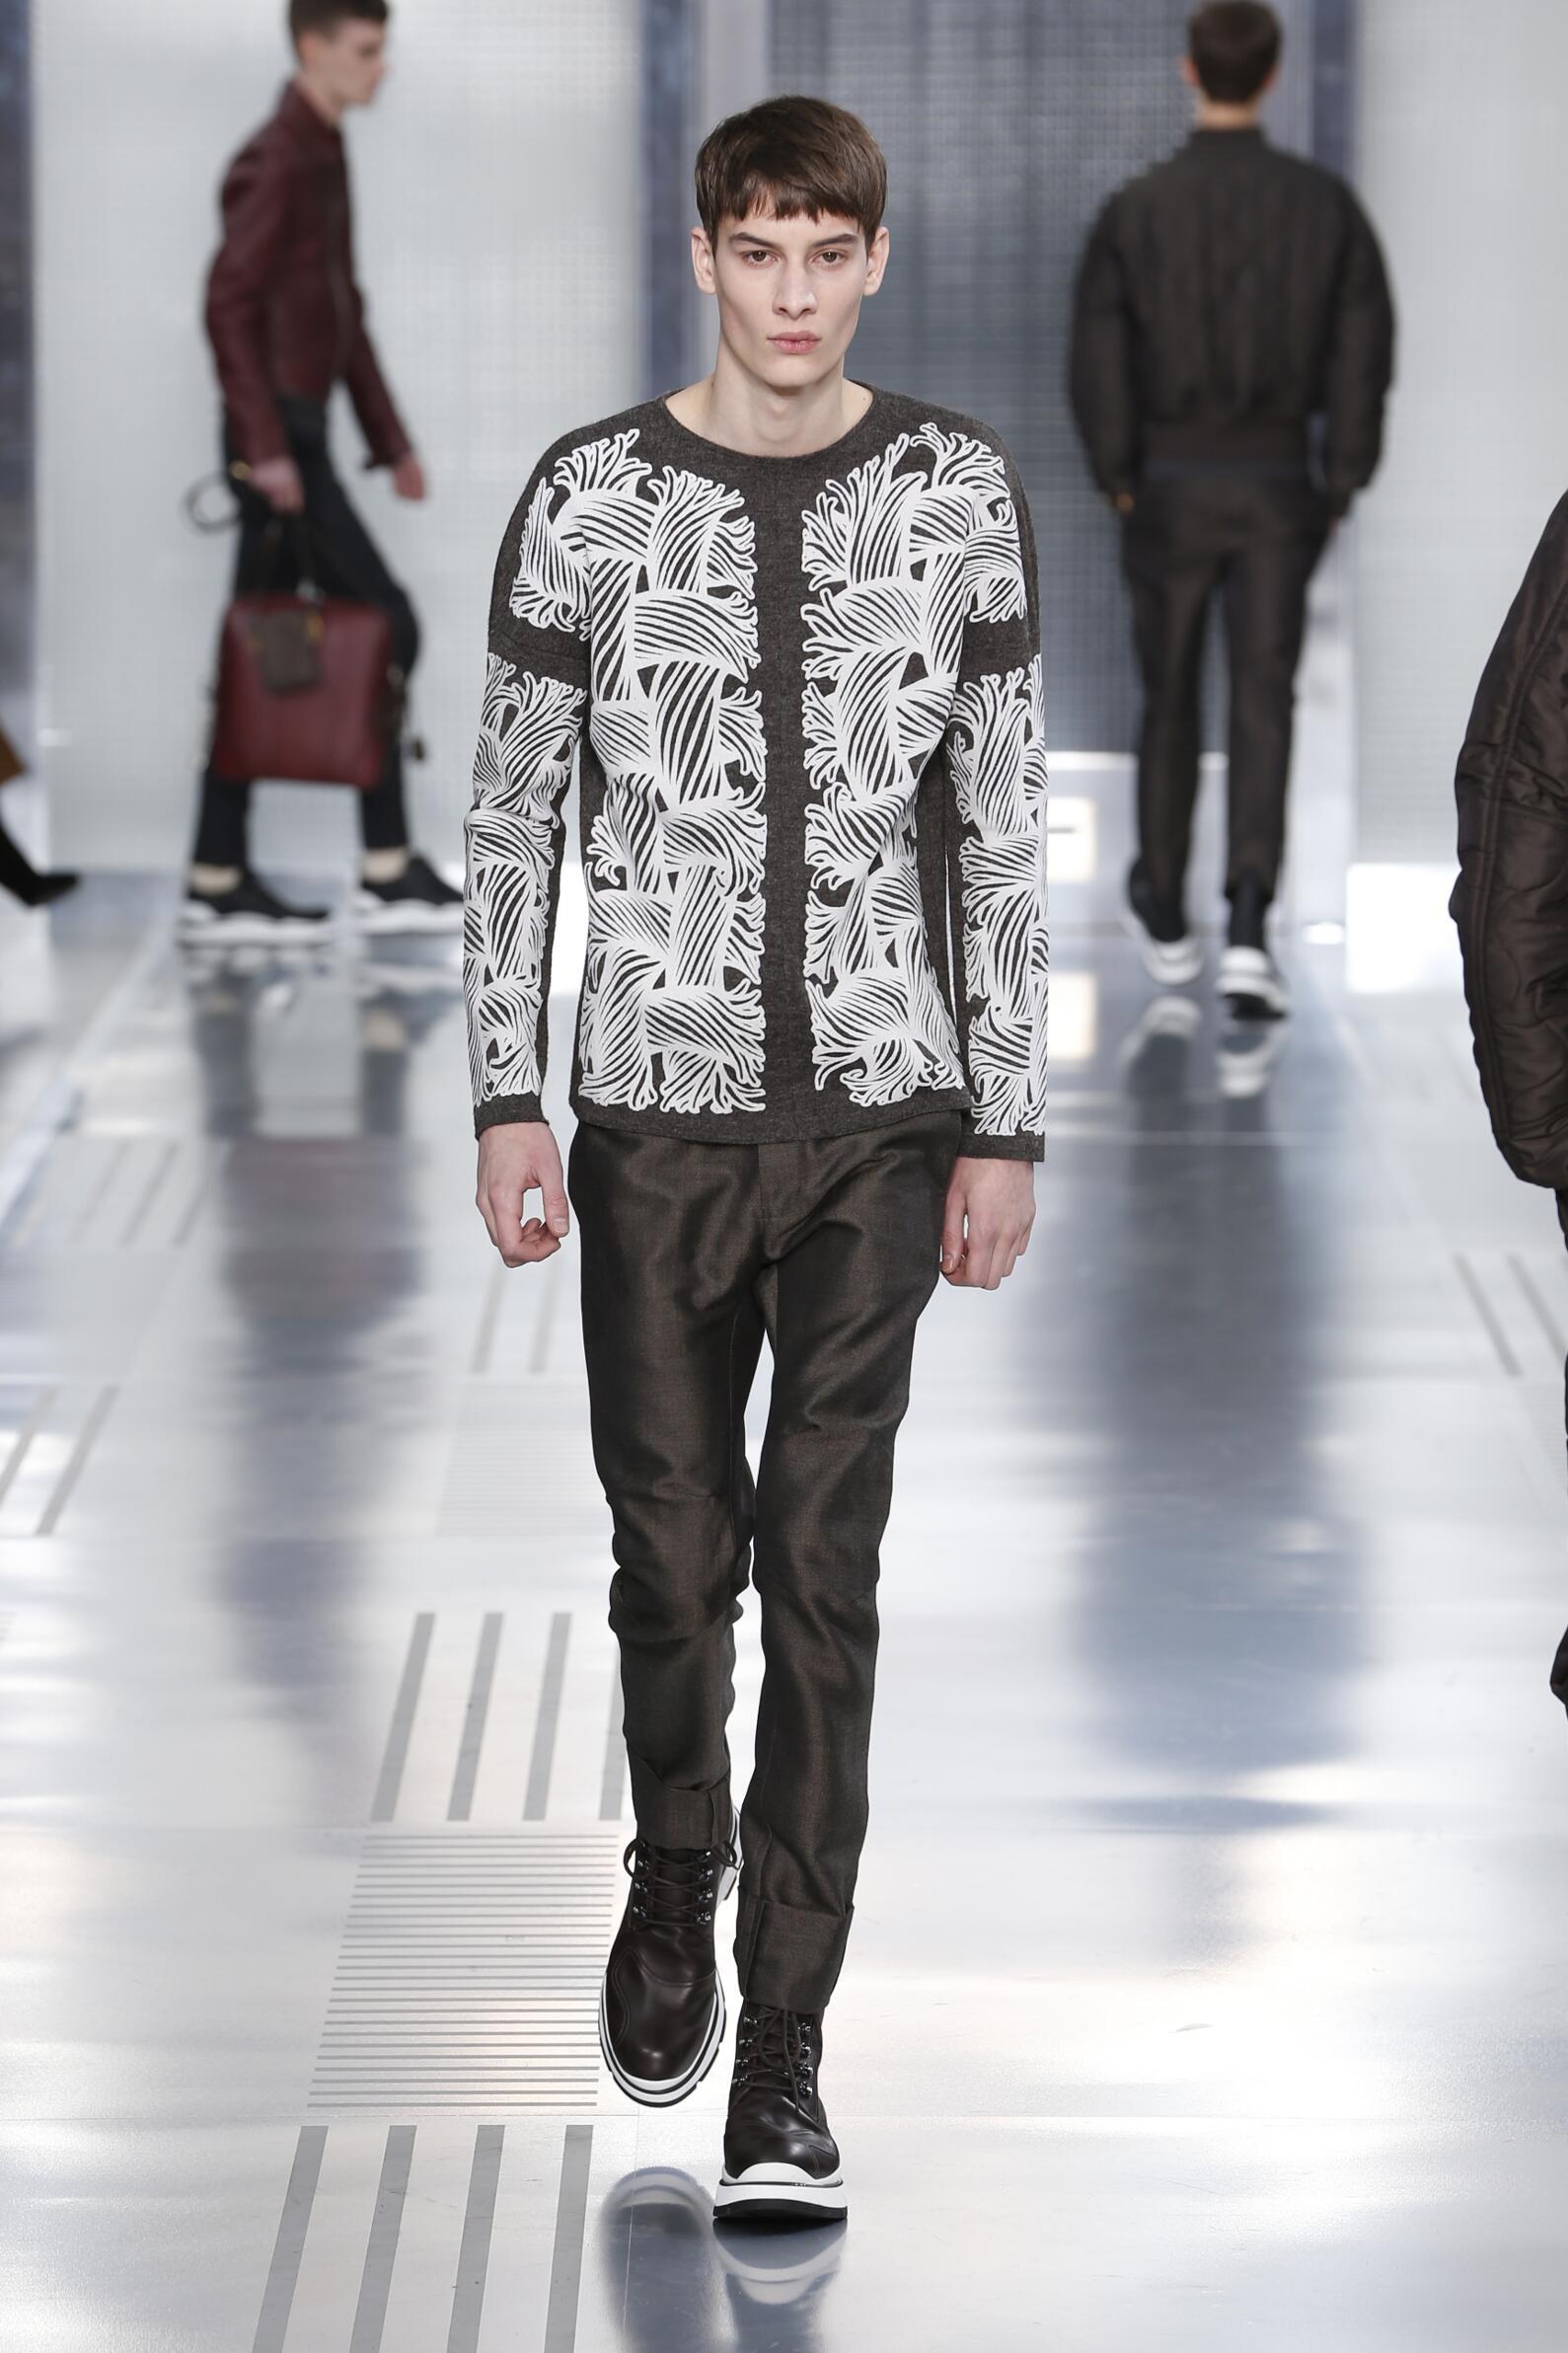 Louis Vuitton Collection Paris Fashion Week Menswear